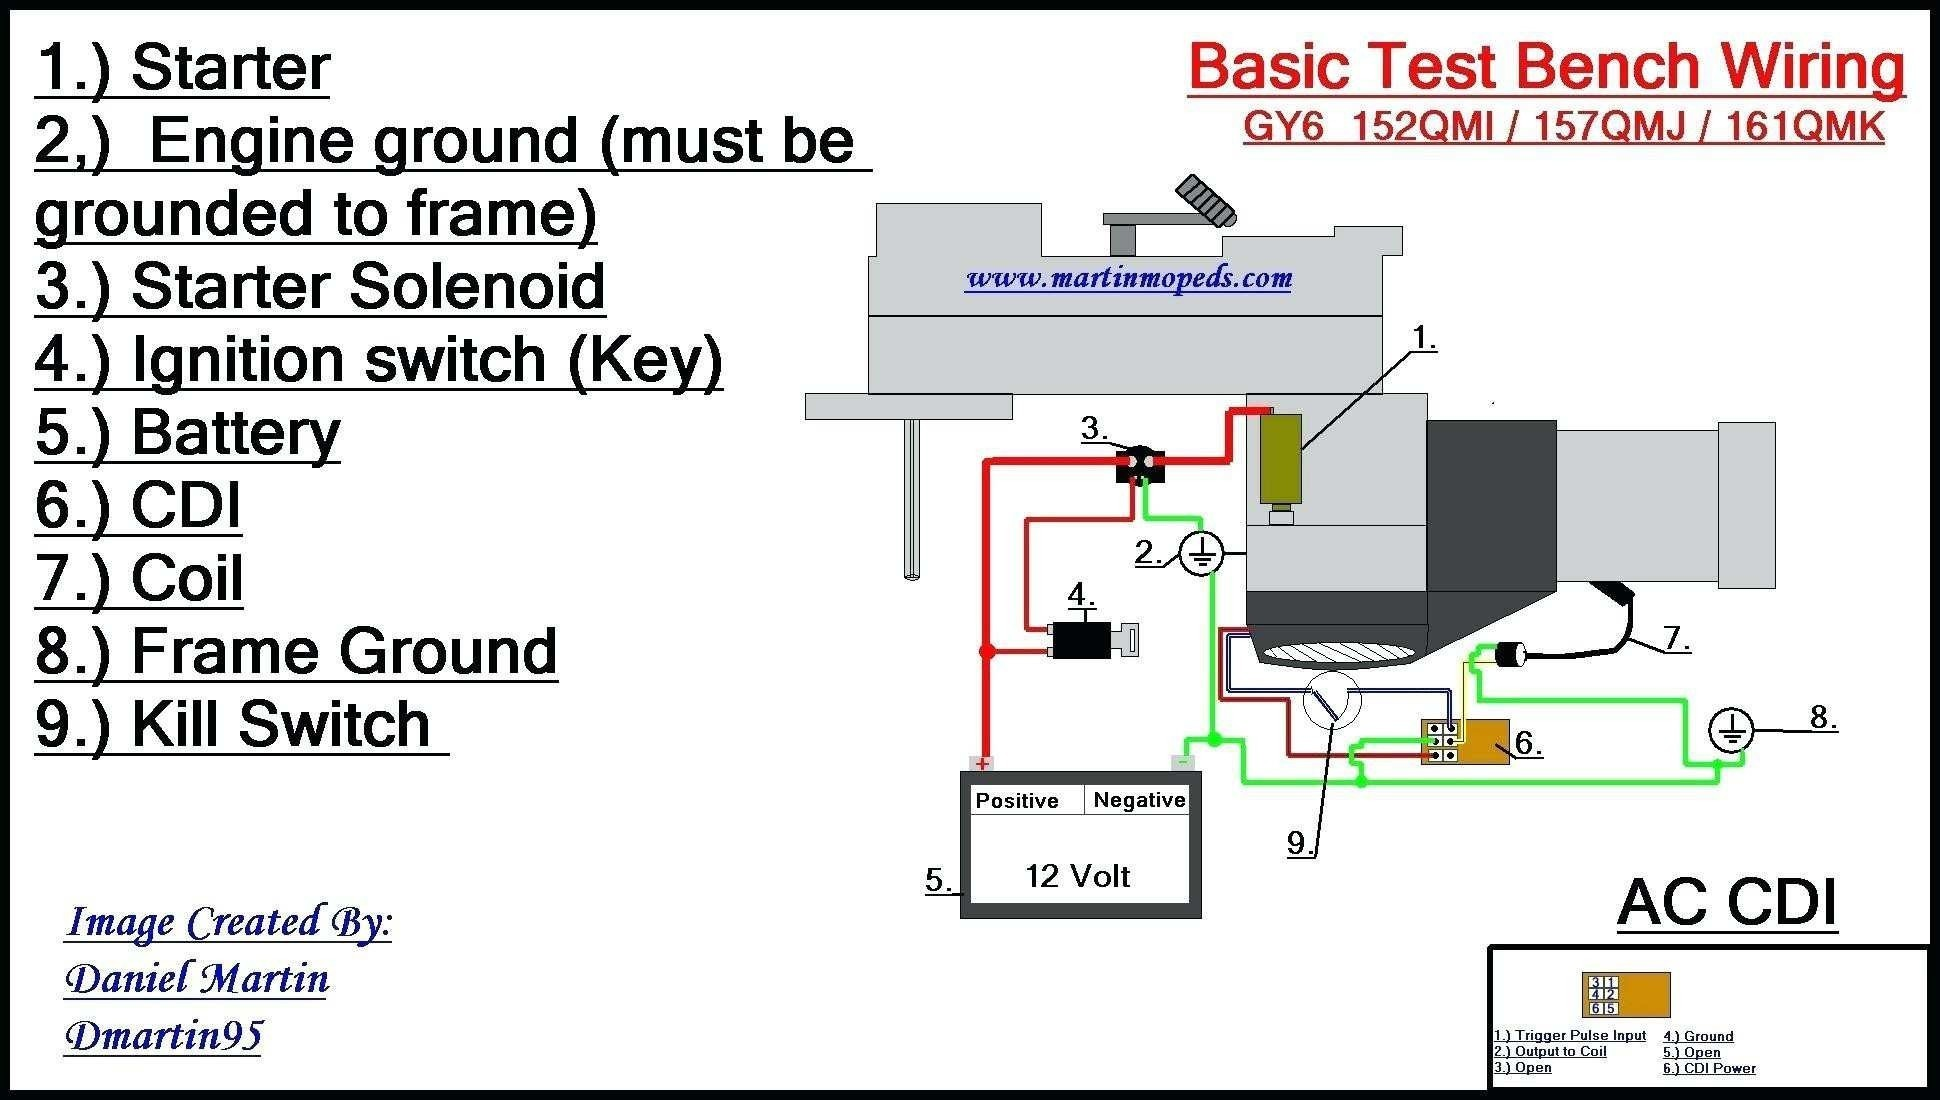 24v starter solenoid wiring diagram rb 2807  st81 solenoid wiring diagram  rb 2807  st81 solenoid wiring diagram